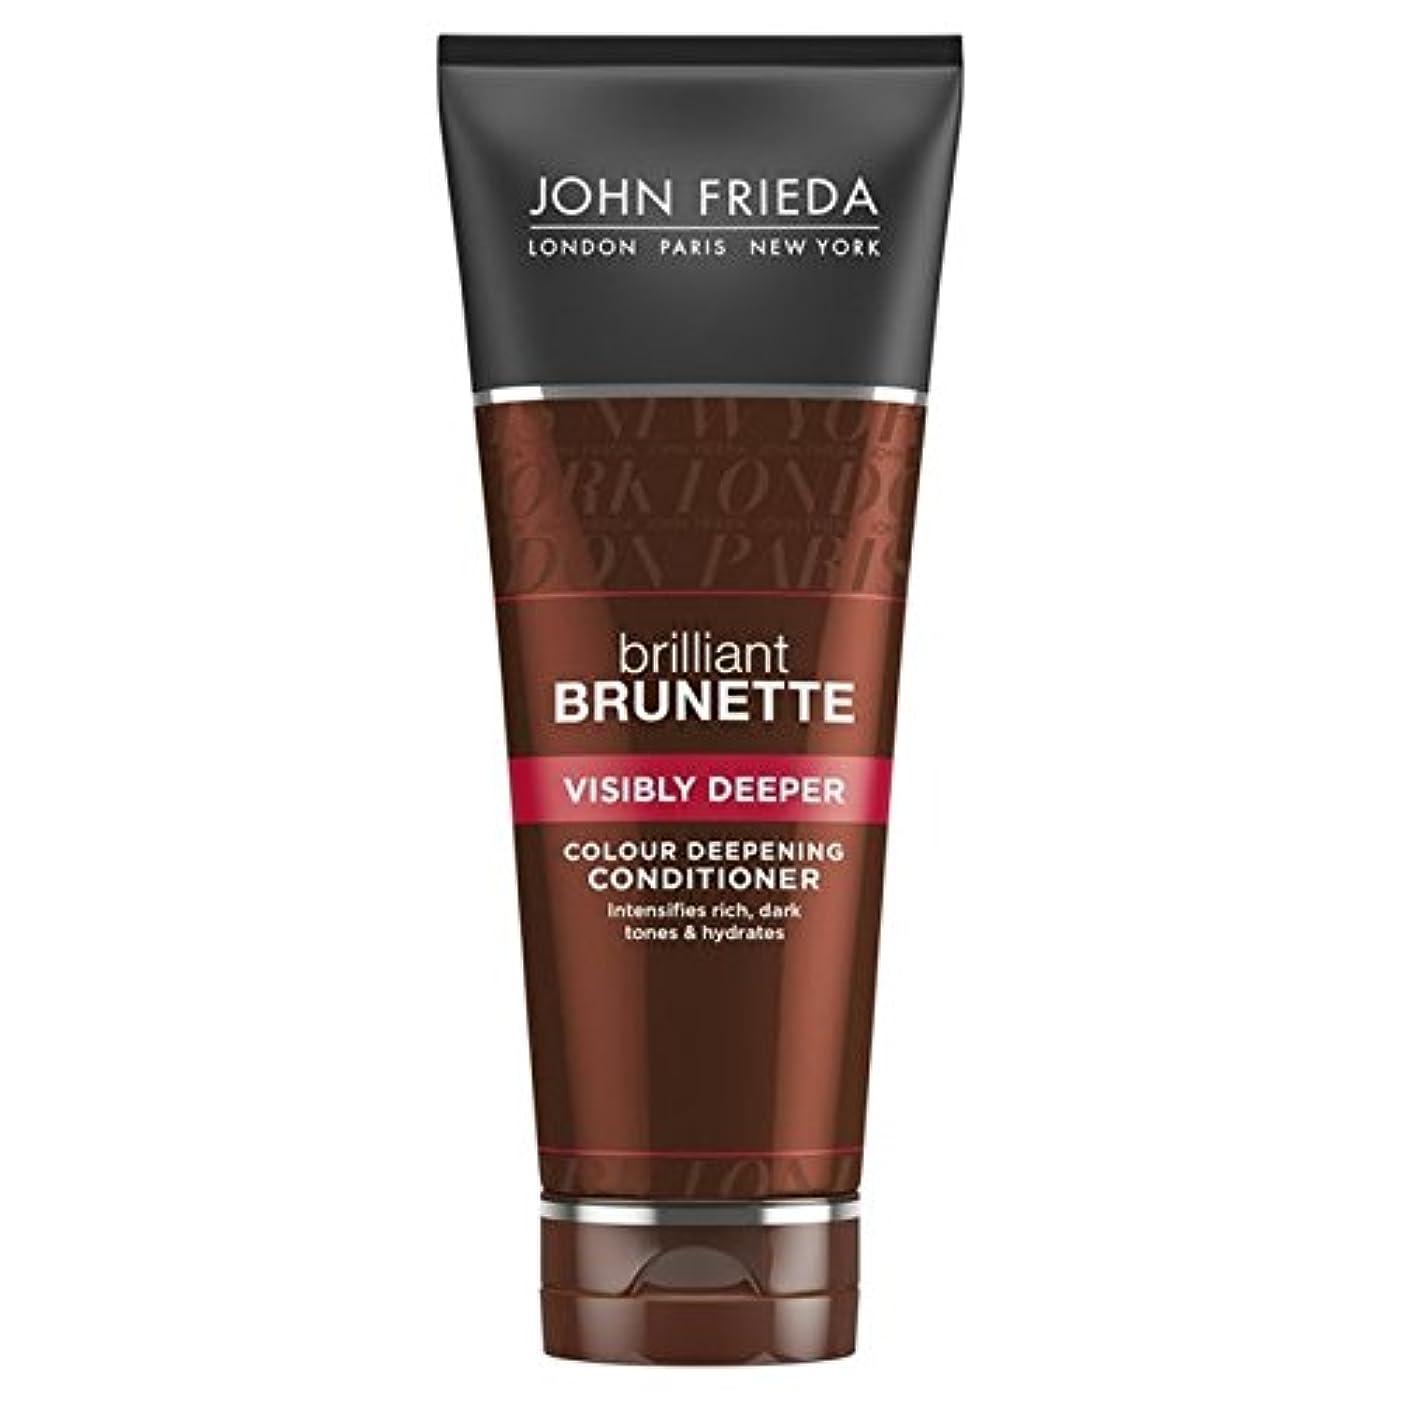 John Frieda Brilliant Brunette Visibly Deeper Conditioner 250ml (Pack of 6) - ジョン?フリーダ華麗なブルネット目に見えてより深いコンディショナー...